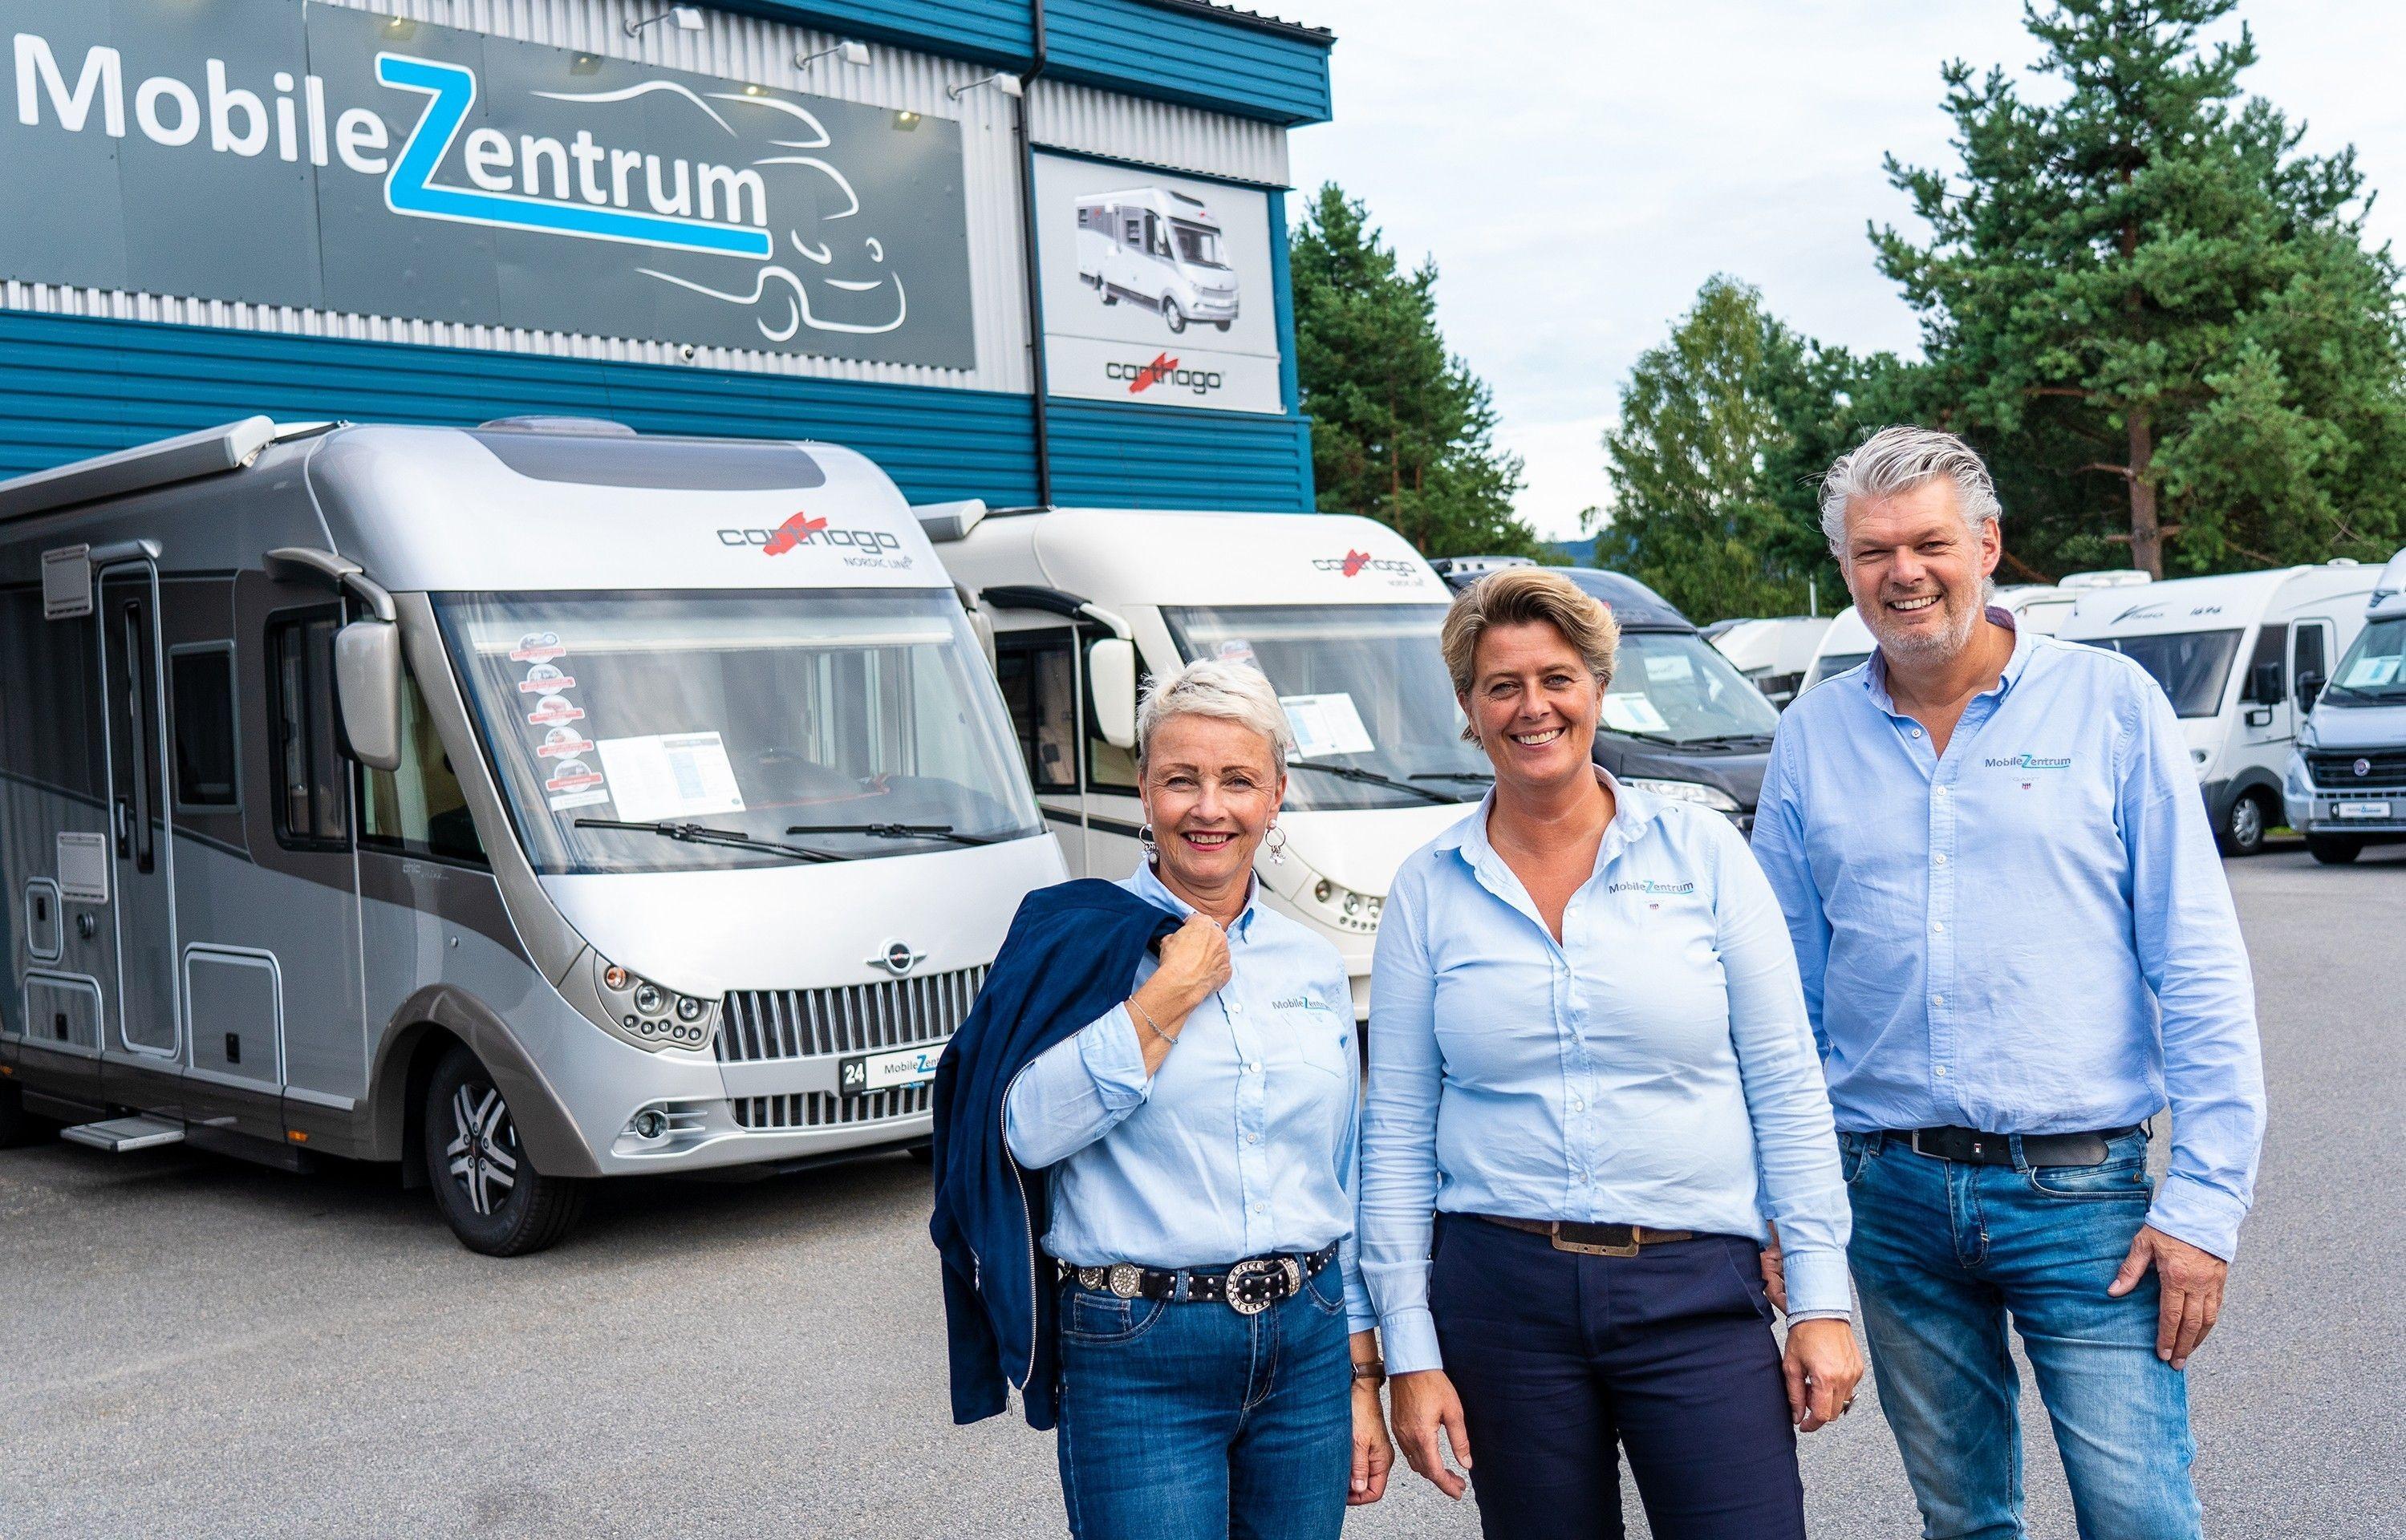 MobileZentrum satser stort på tyske kvalitetsbobiler i Hokksund.